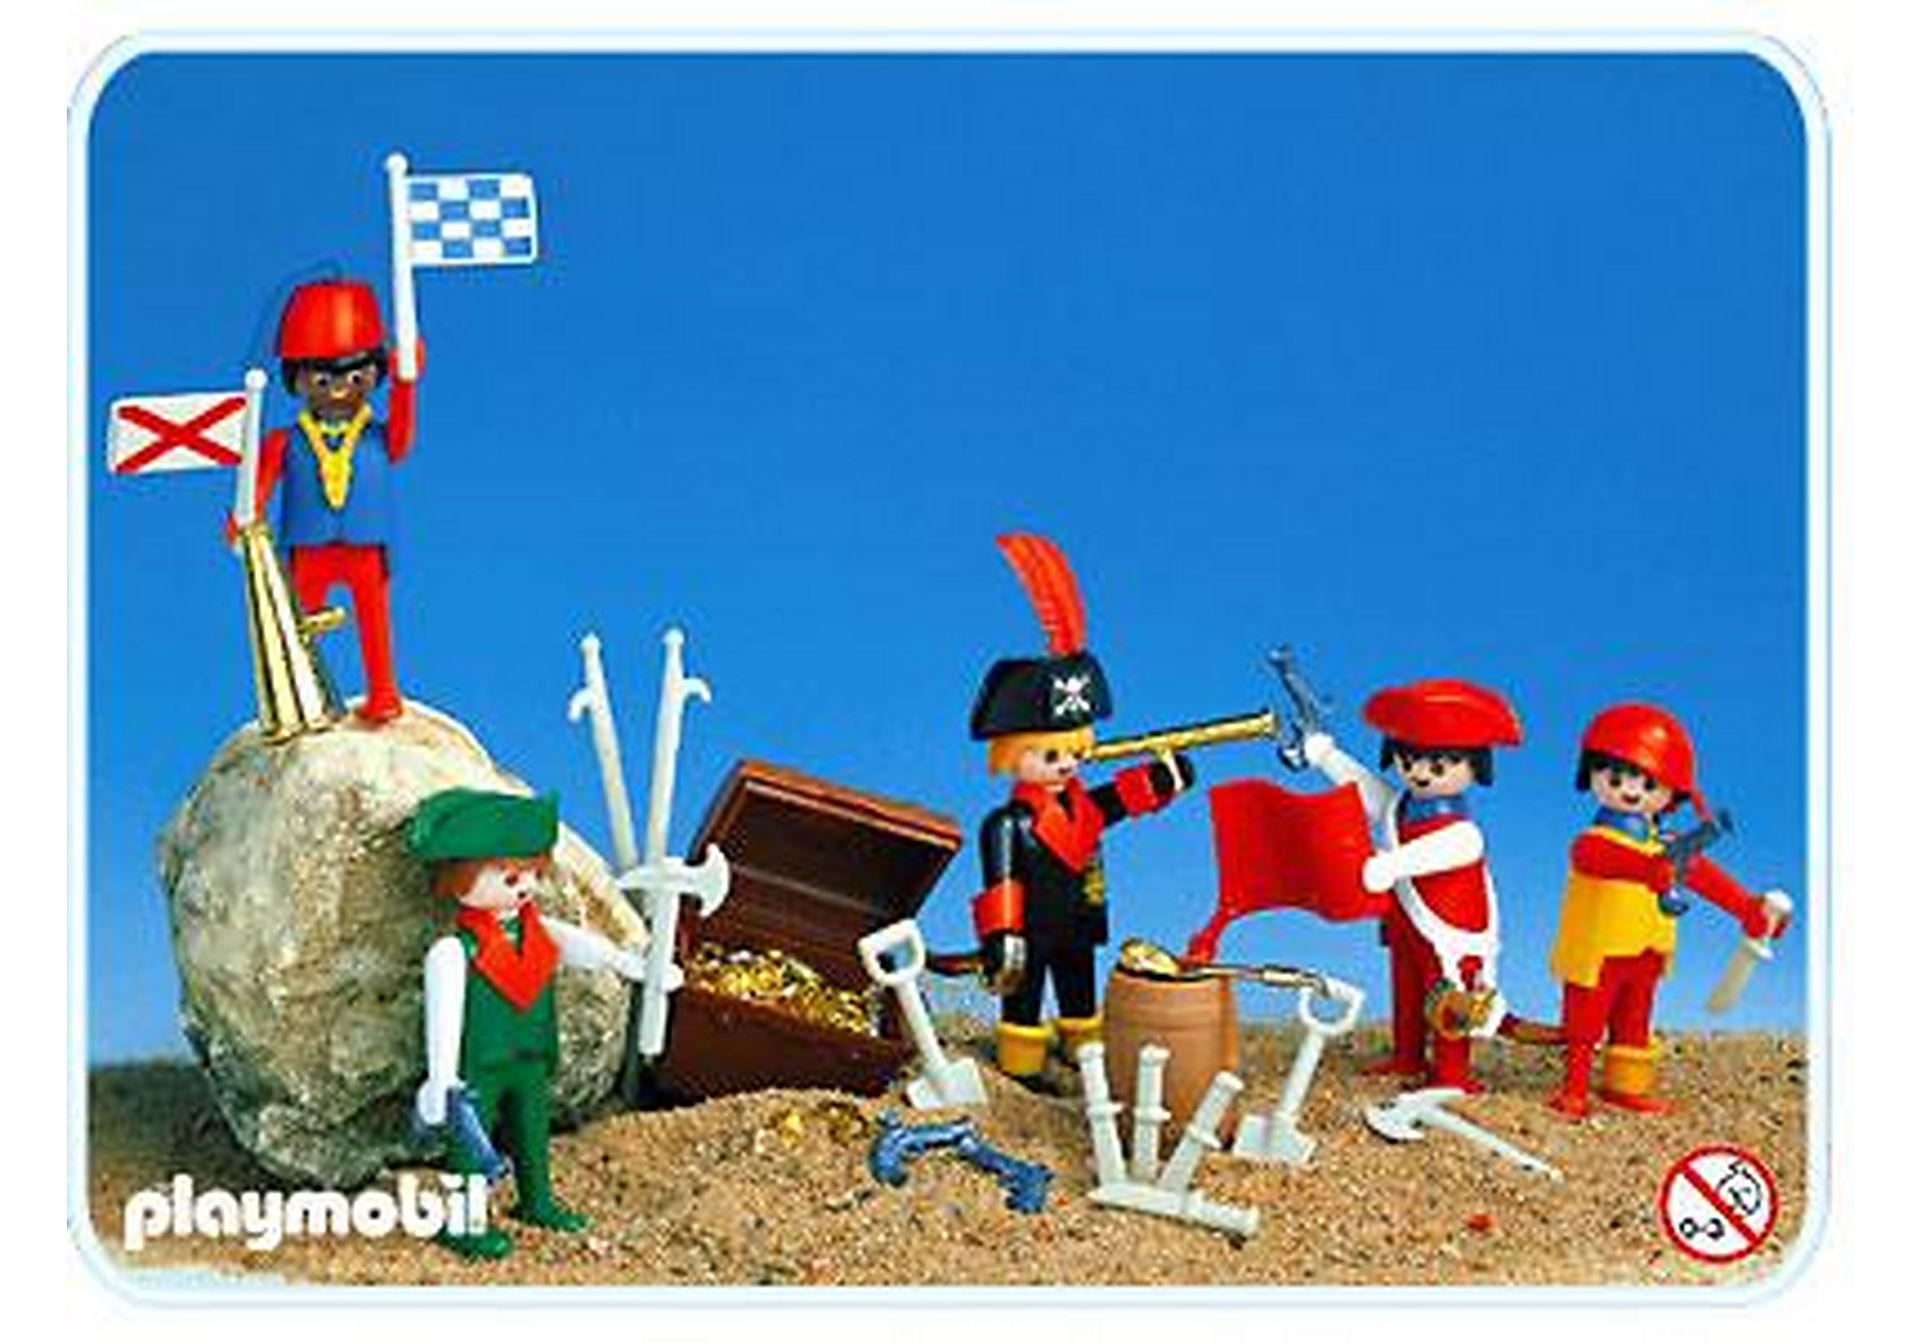 http://media.playmobil.com/i/playmobil/3542-A_product_detail/Pirates